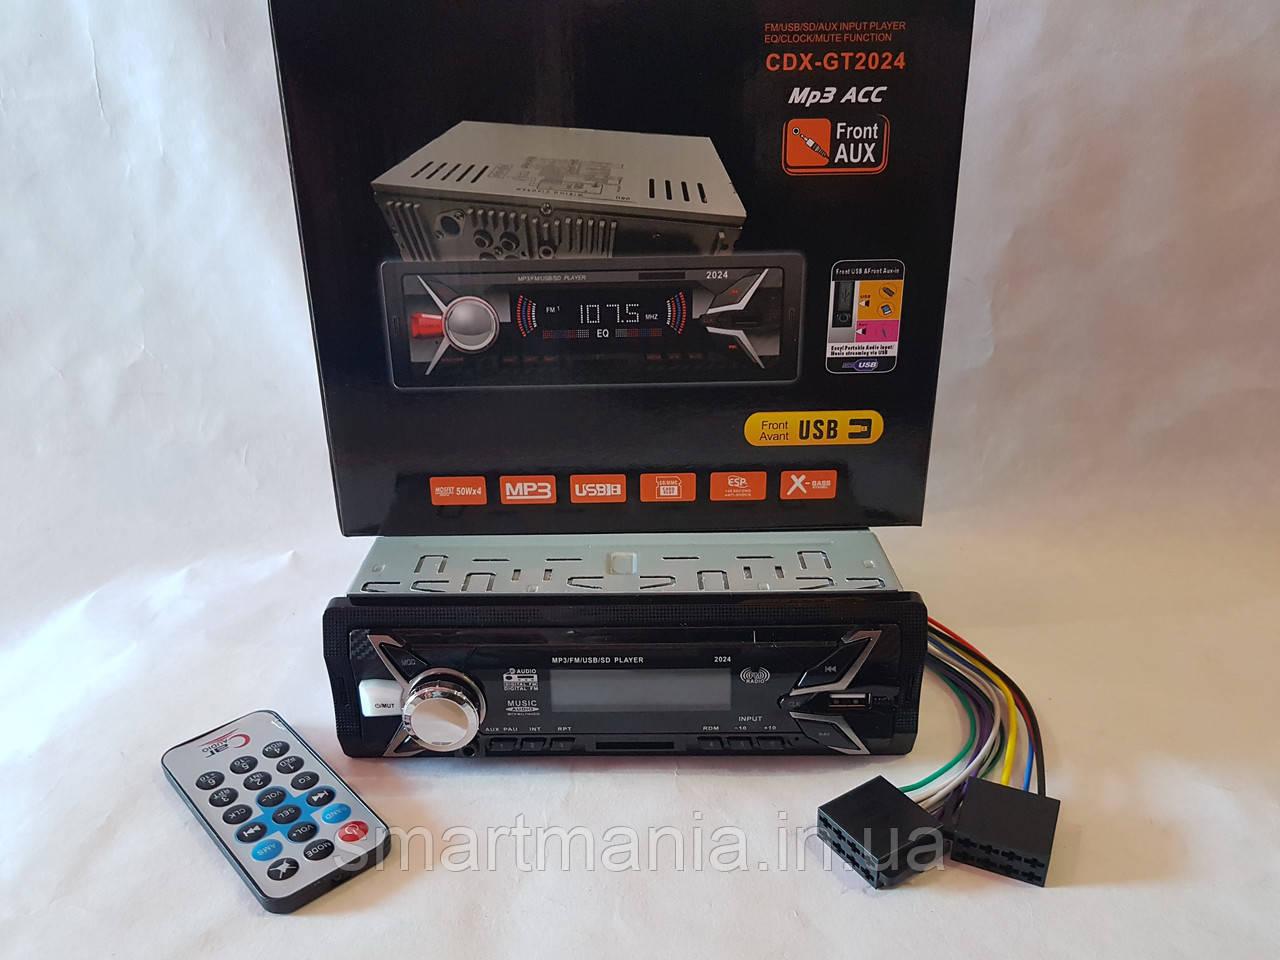 Авто Автомагнитола MP3, CDX-GT2024 (USB, SDHC, AUX, FM)